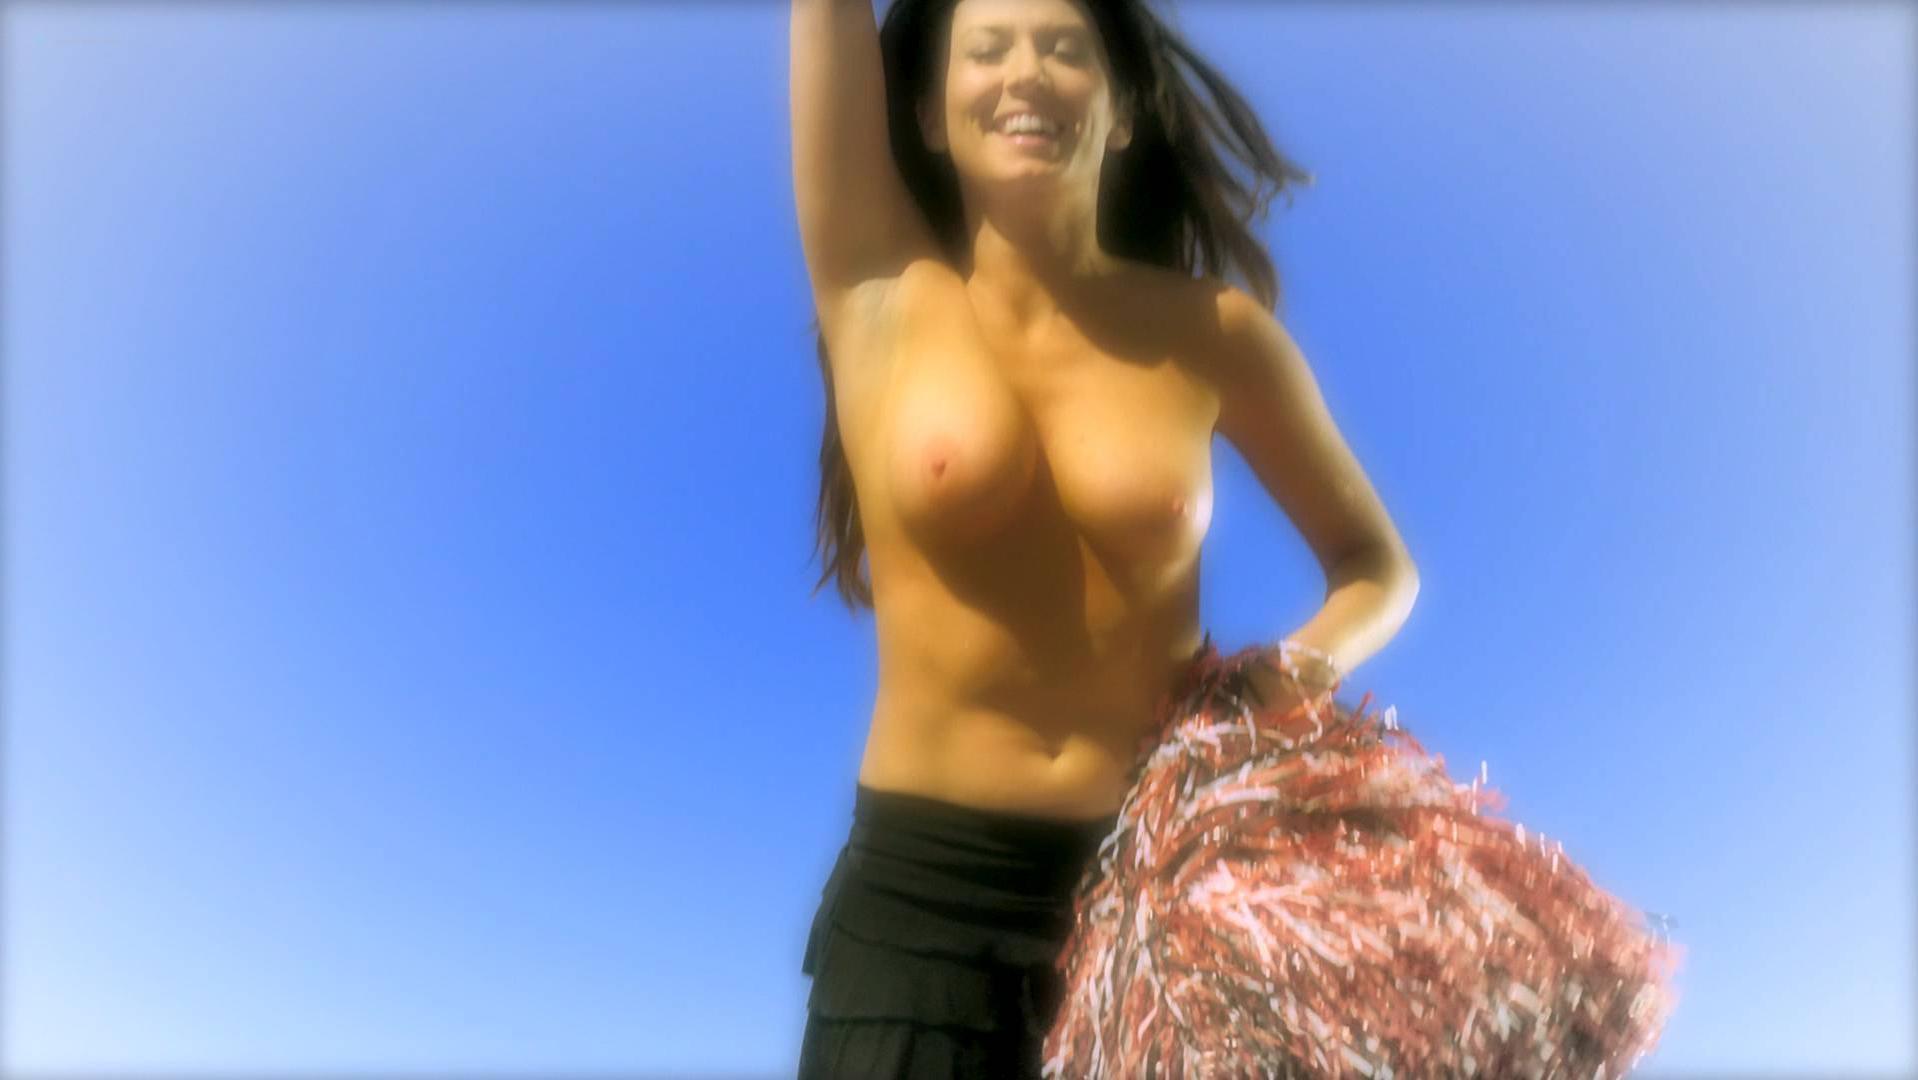 Michaela Myers nude, Harmony Blossom nude, Erica Duke nude, Diane Jay Gonzalez nude, Meryl Bush nude - #1 Cheerleader Camp (2010)